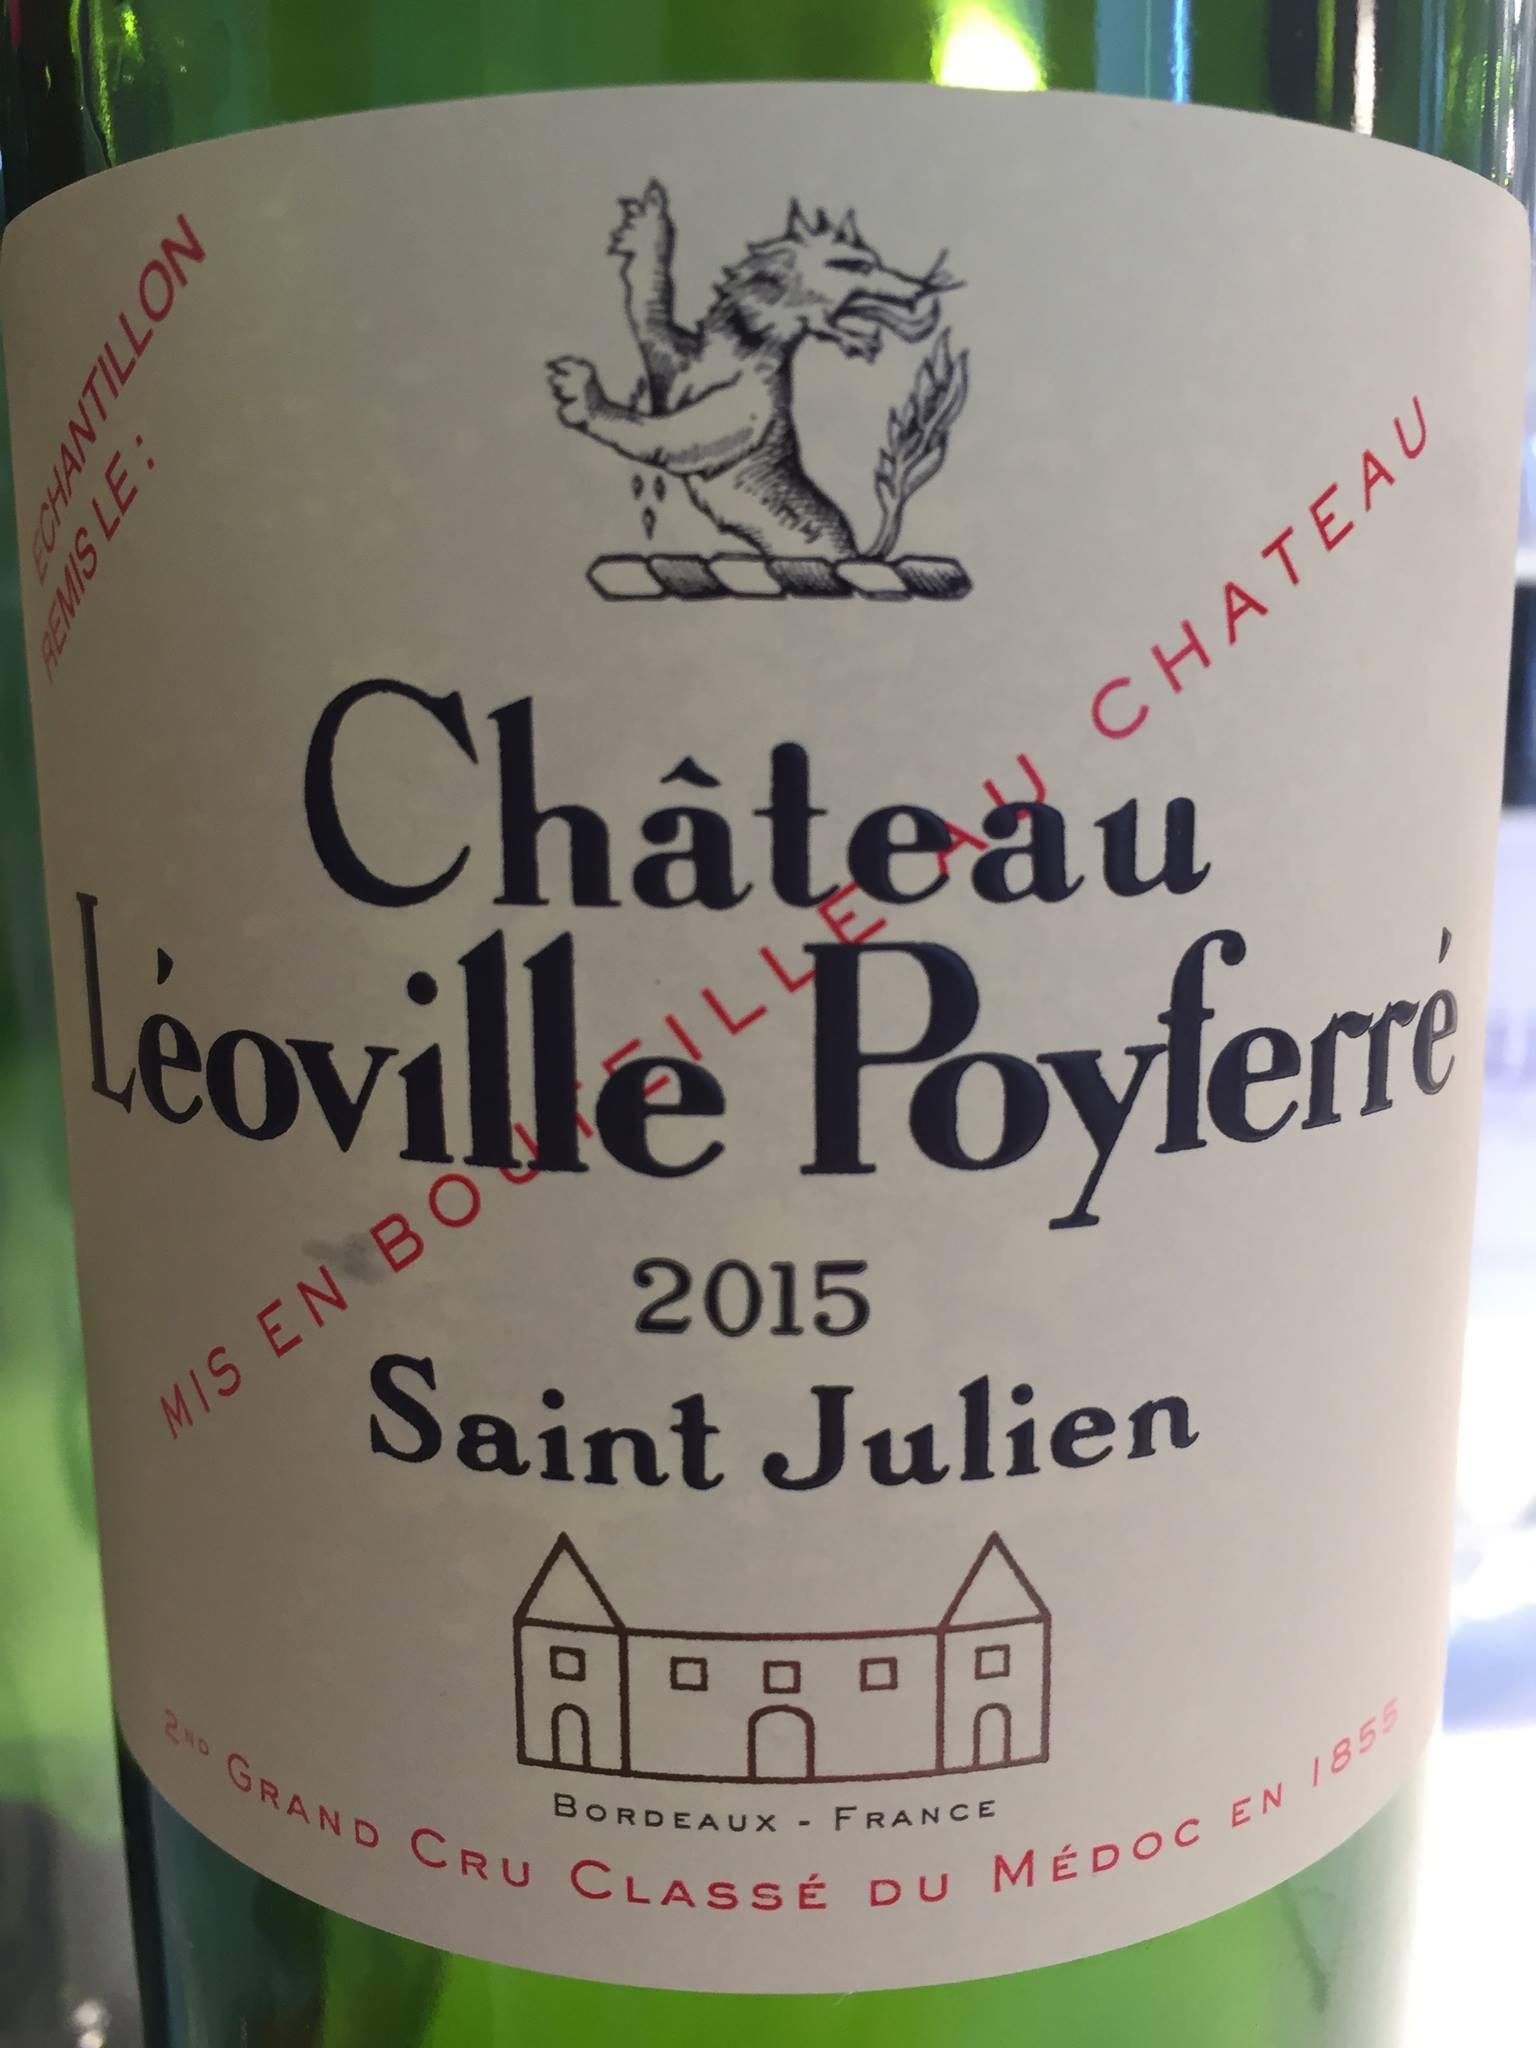 Château Léoville Poyferré 2015 – Saint-Julien, 2nd Grand Cru Classé